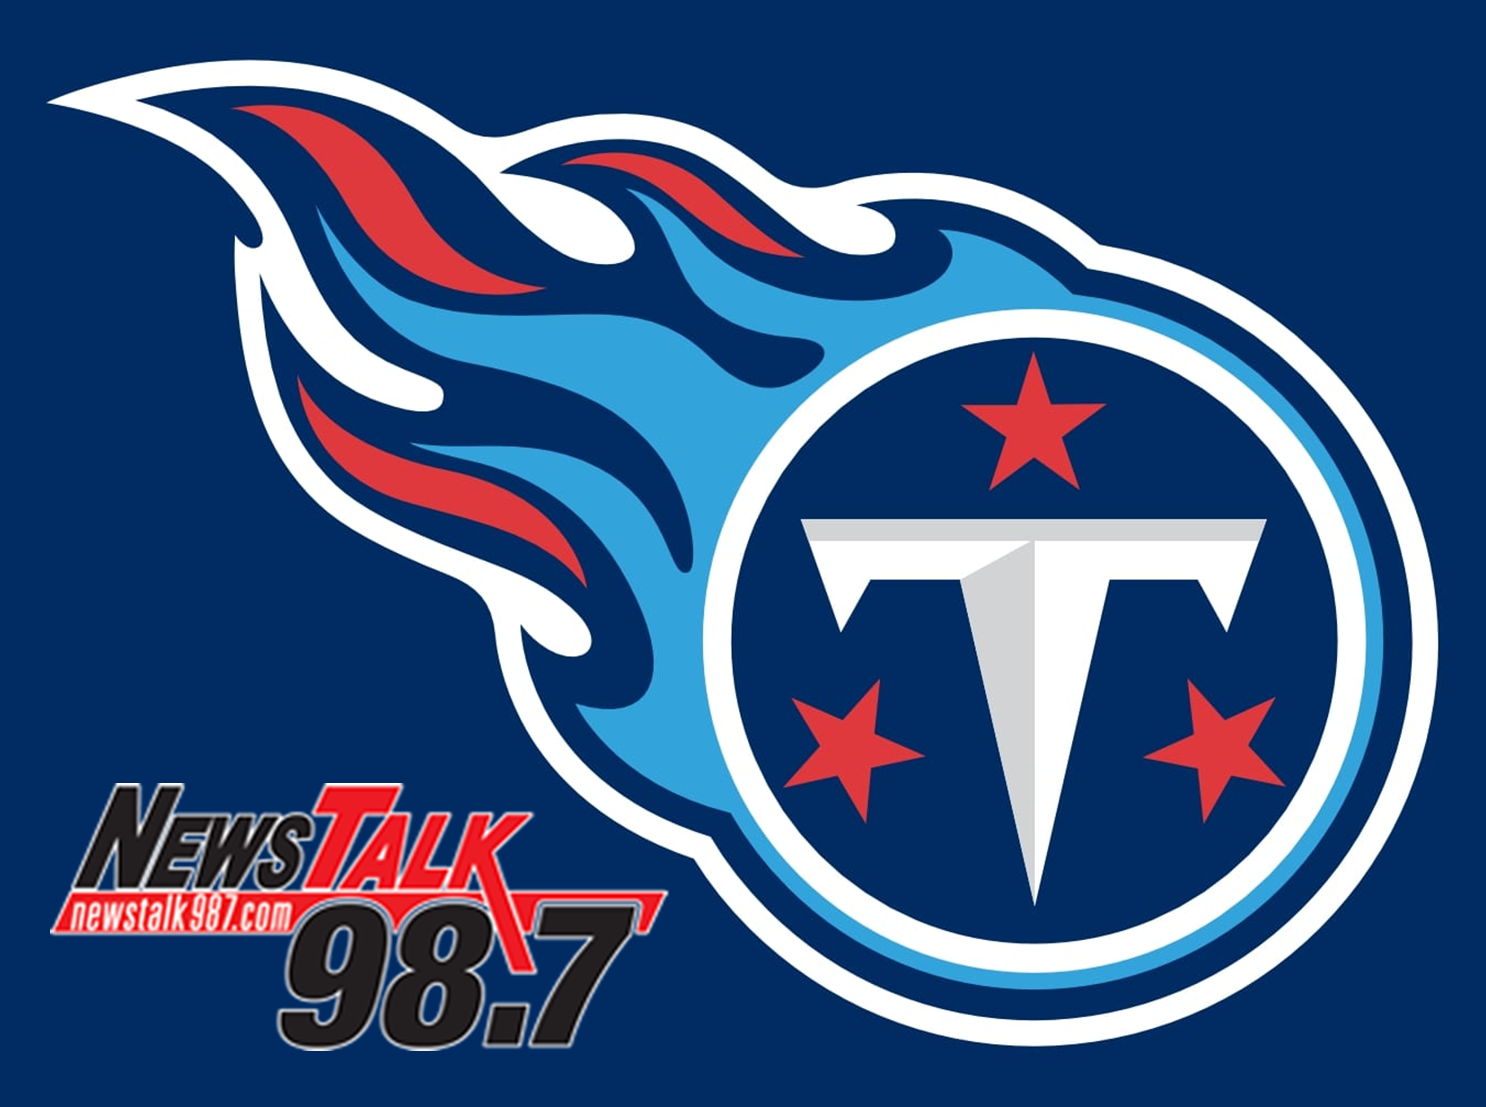 Listen to the Tennessee Titans on Newstalk 98.7!